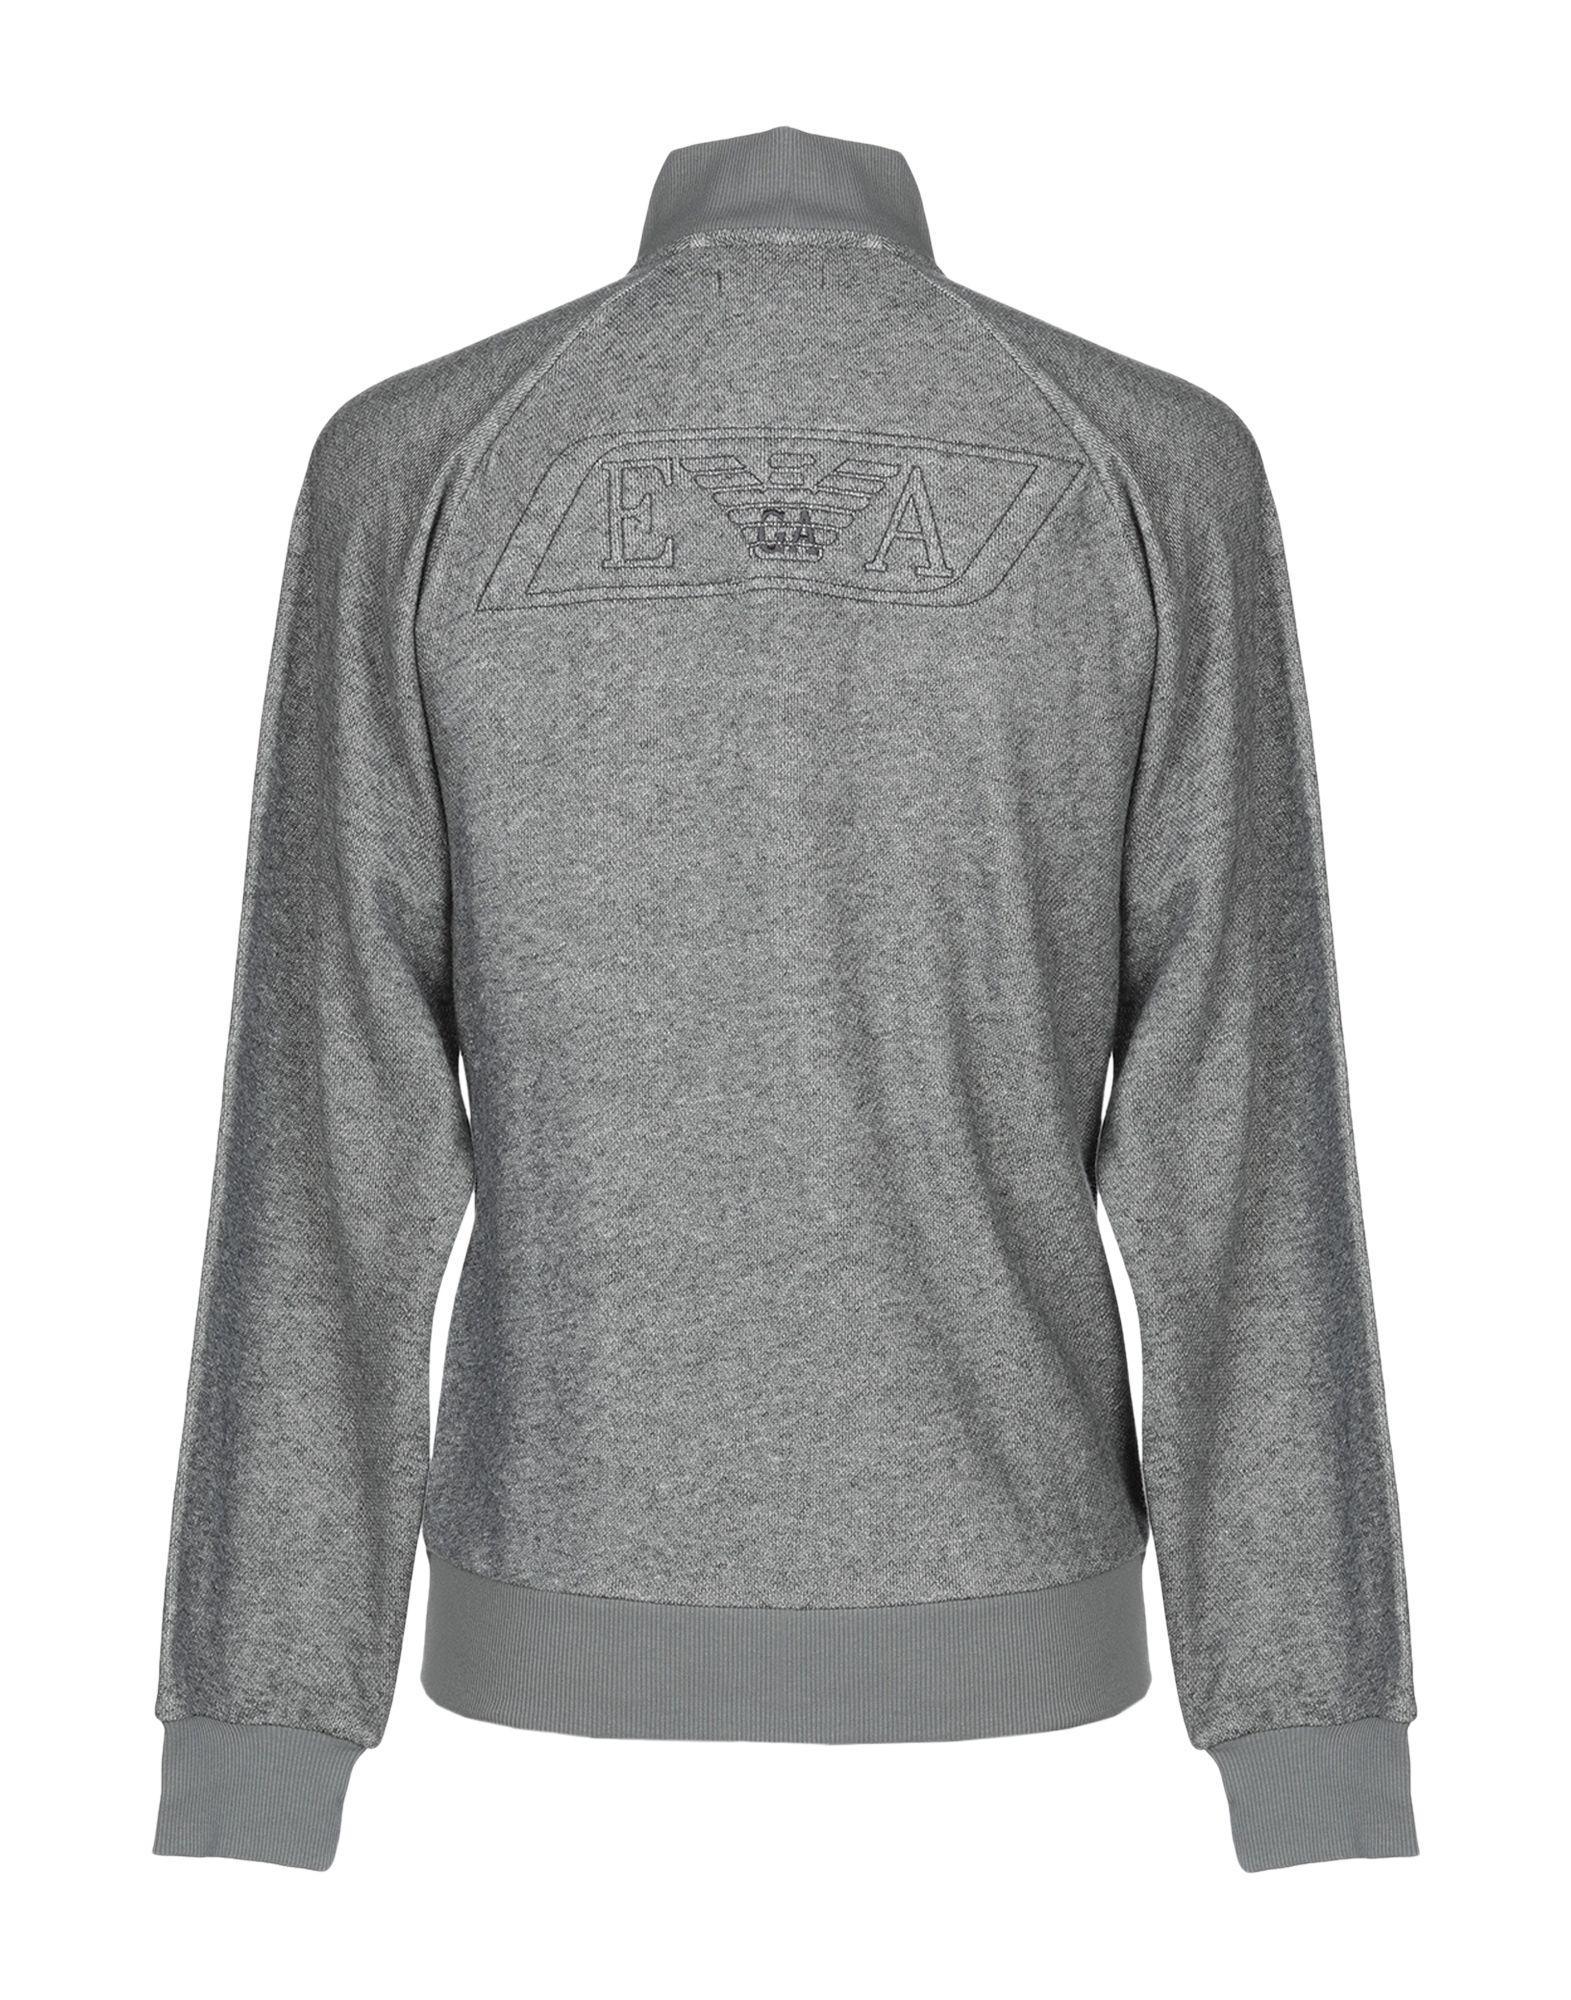 Emporio Armani Sleepwear in Gray for Men - Lyst 180392957